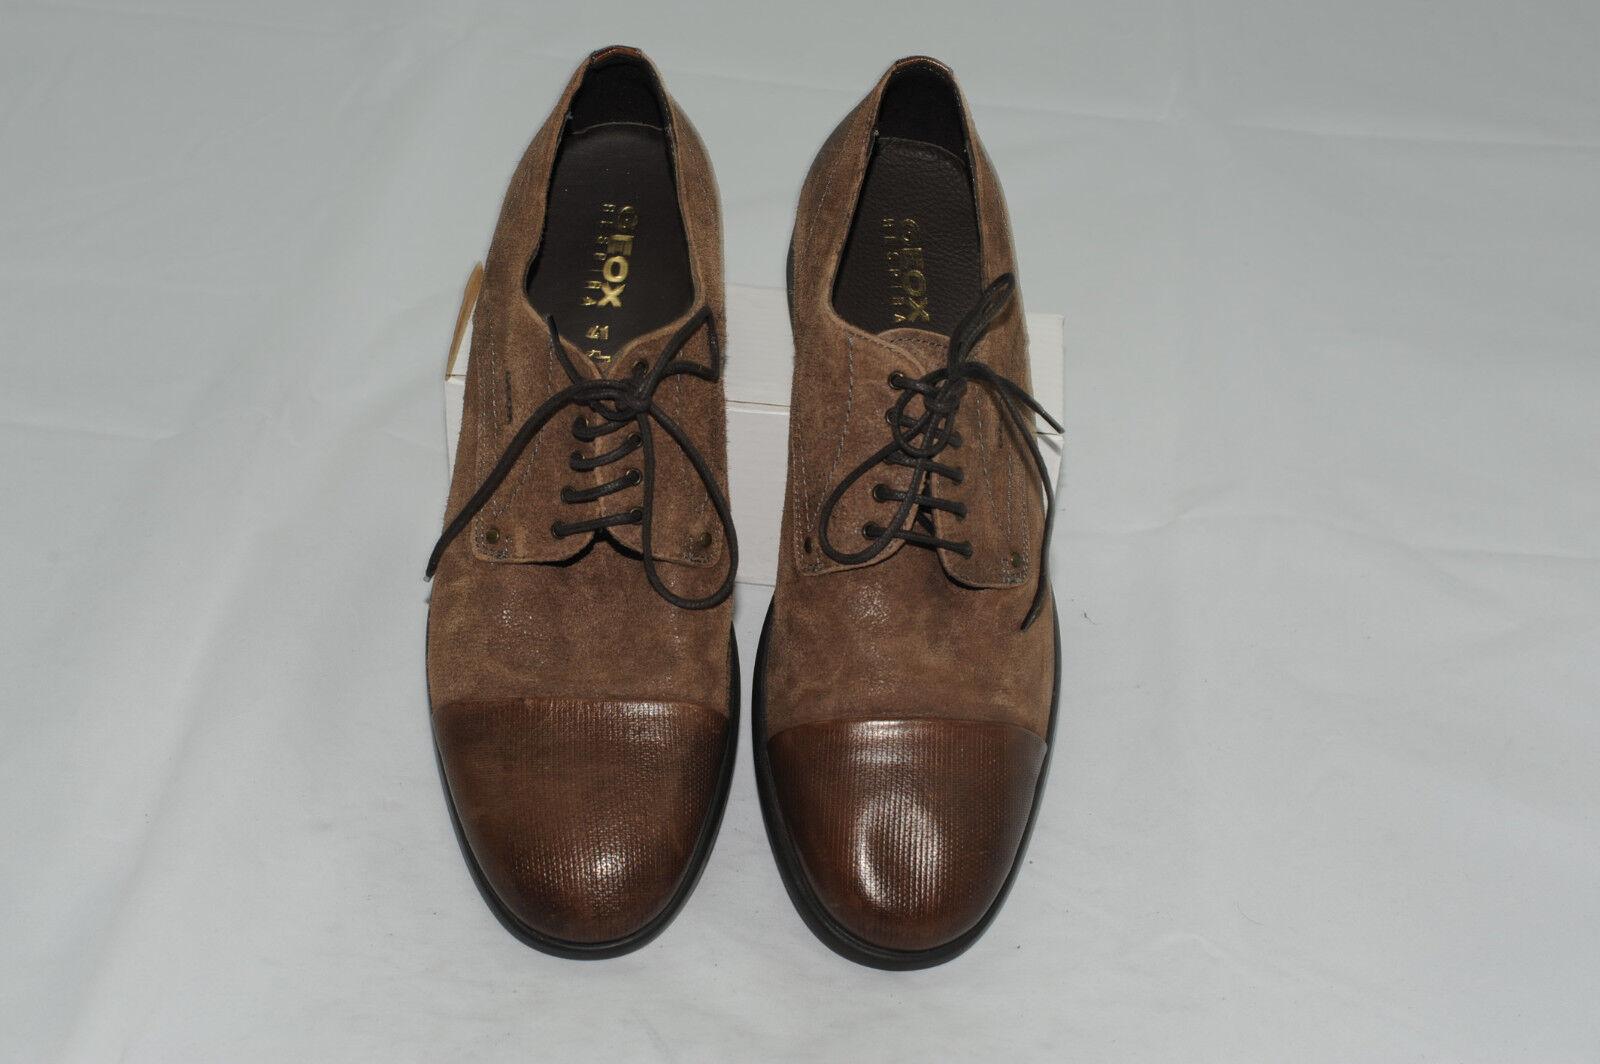 NWOT Geox Respira Men's Cap Toe Leather Oxford Dress shoes (US 8)